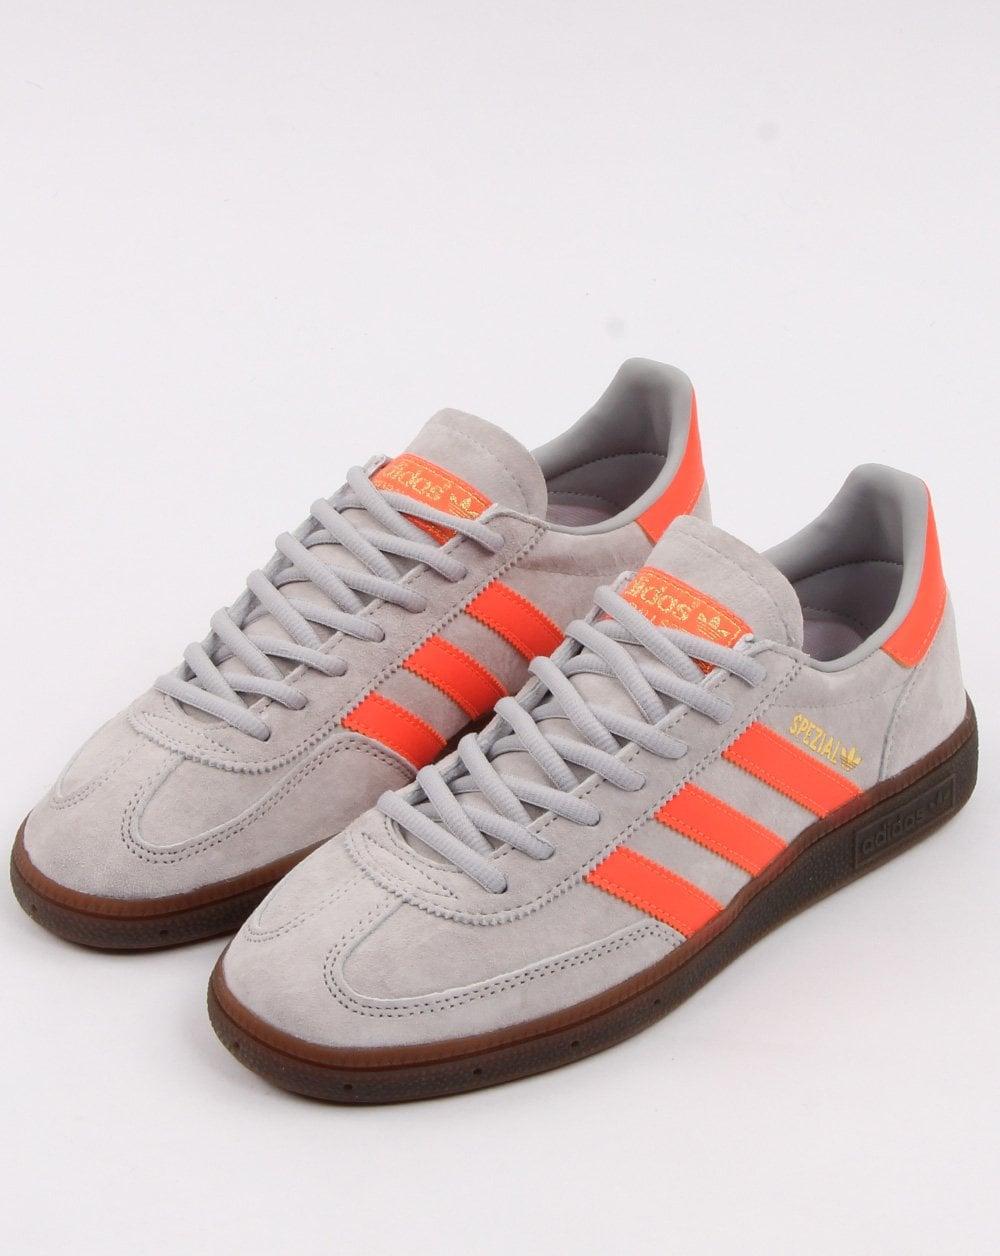 adidas spezial grey orange off 65